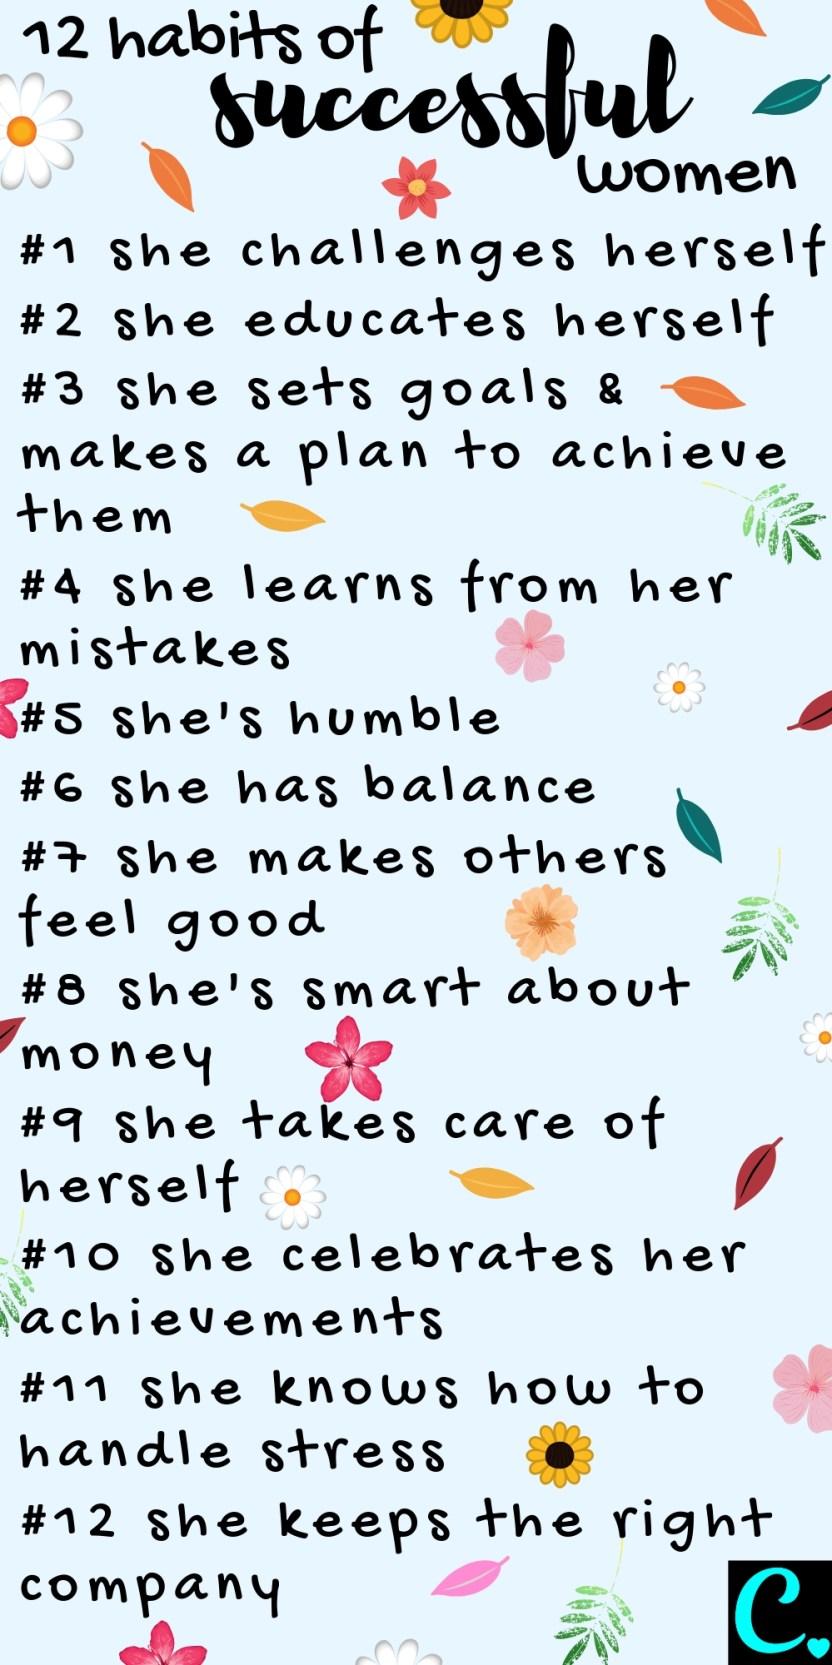 12 Habits of Successful Women Infographic #habits #habitsofsuccessfulpeople #success #successful #successfulwomen #successmindset